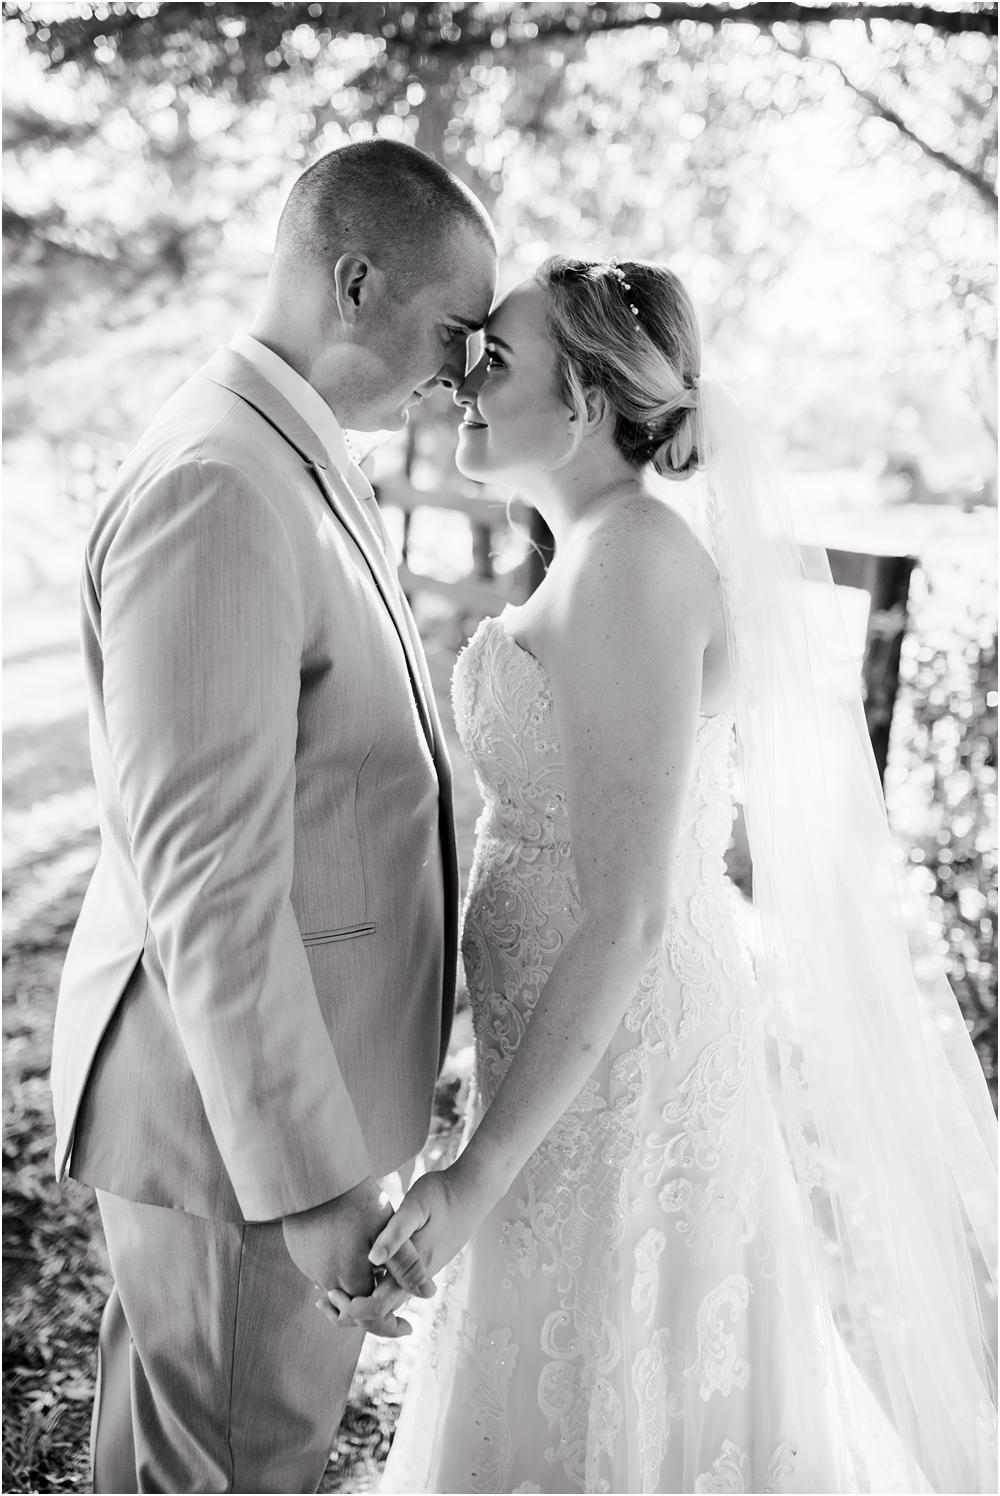 matthew-wedding-kiersten-stevenson-photography-30a-panama-city-beach-dothan-tallahassee-(163-of-579).JPG